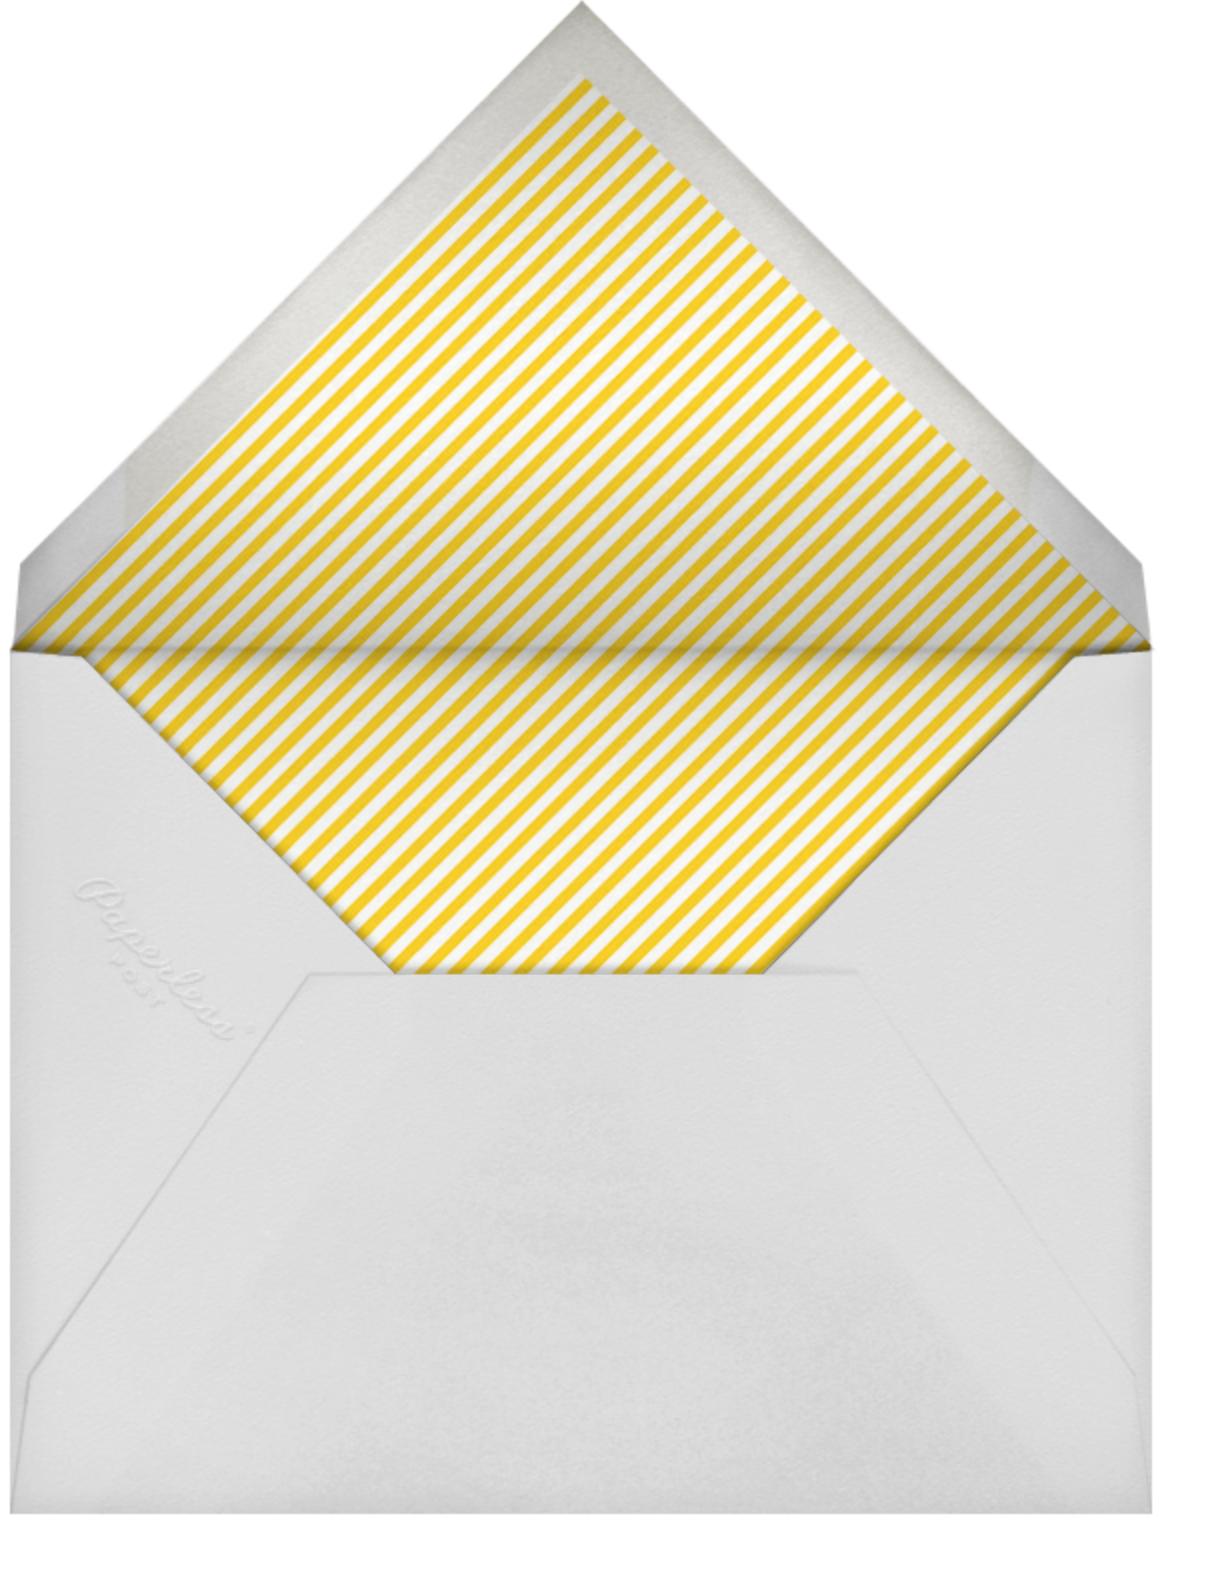 Lollipop - Japanese Mix - Mr. Boddington's Studio - Purim - envelope back